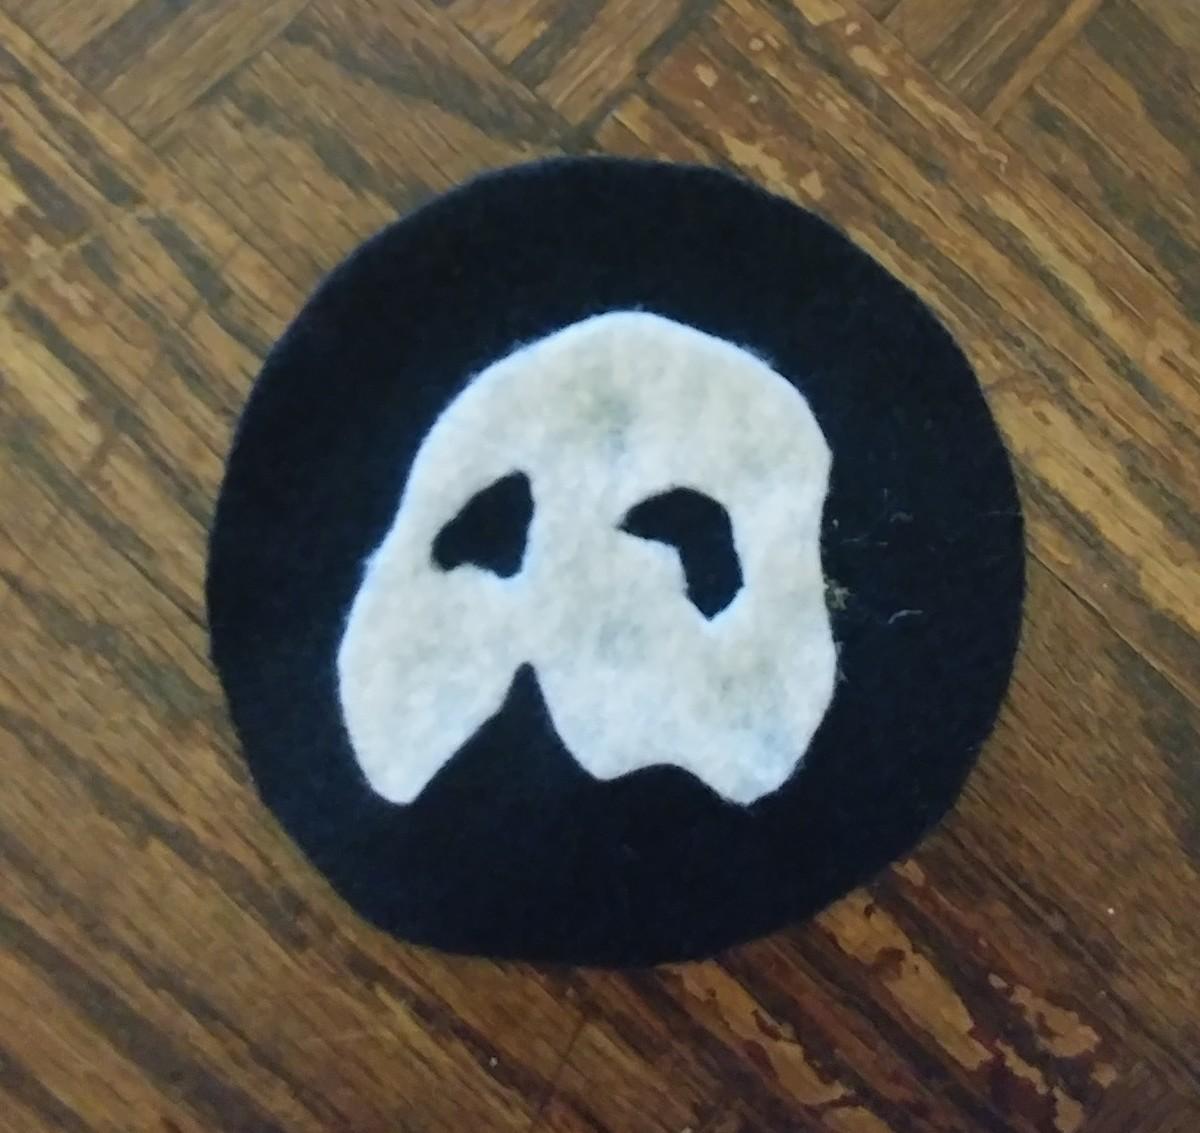 Hot glue the mask on the black circle.